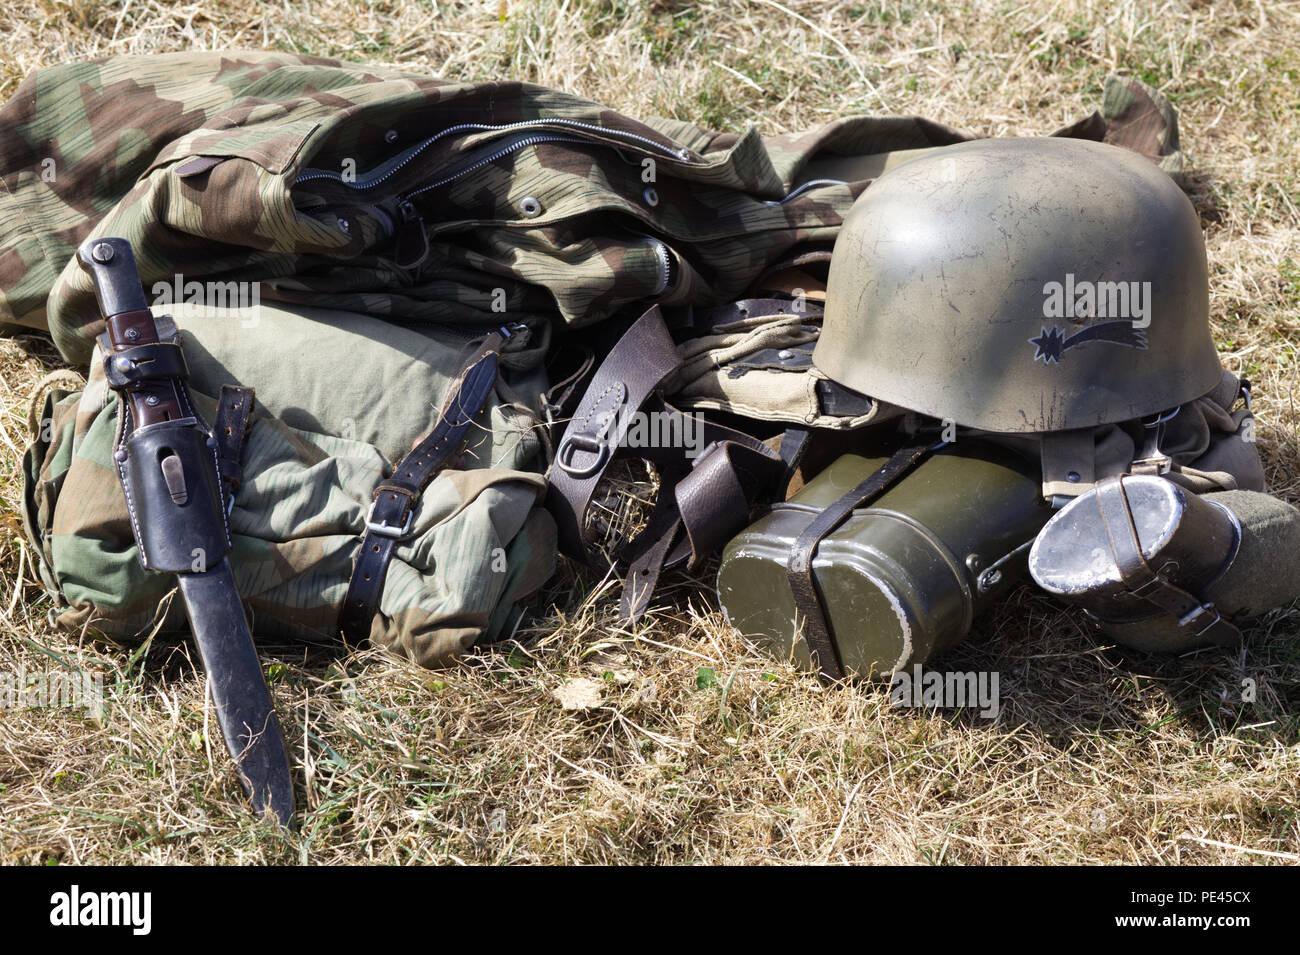 German army field kit - Stock Image